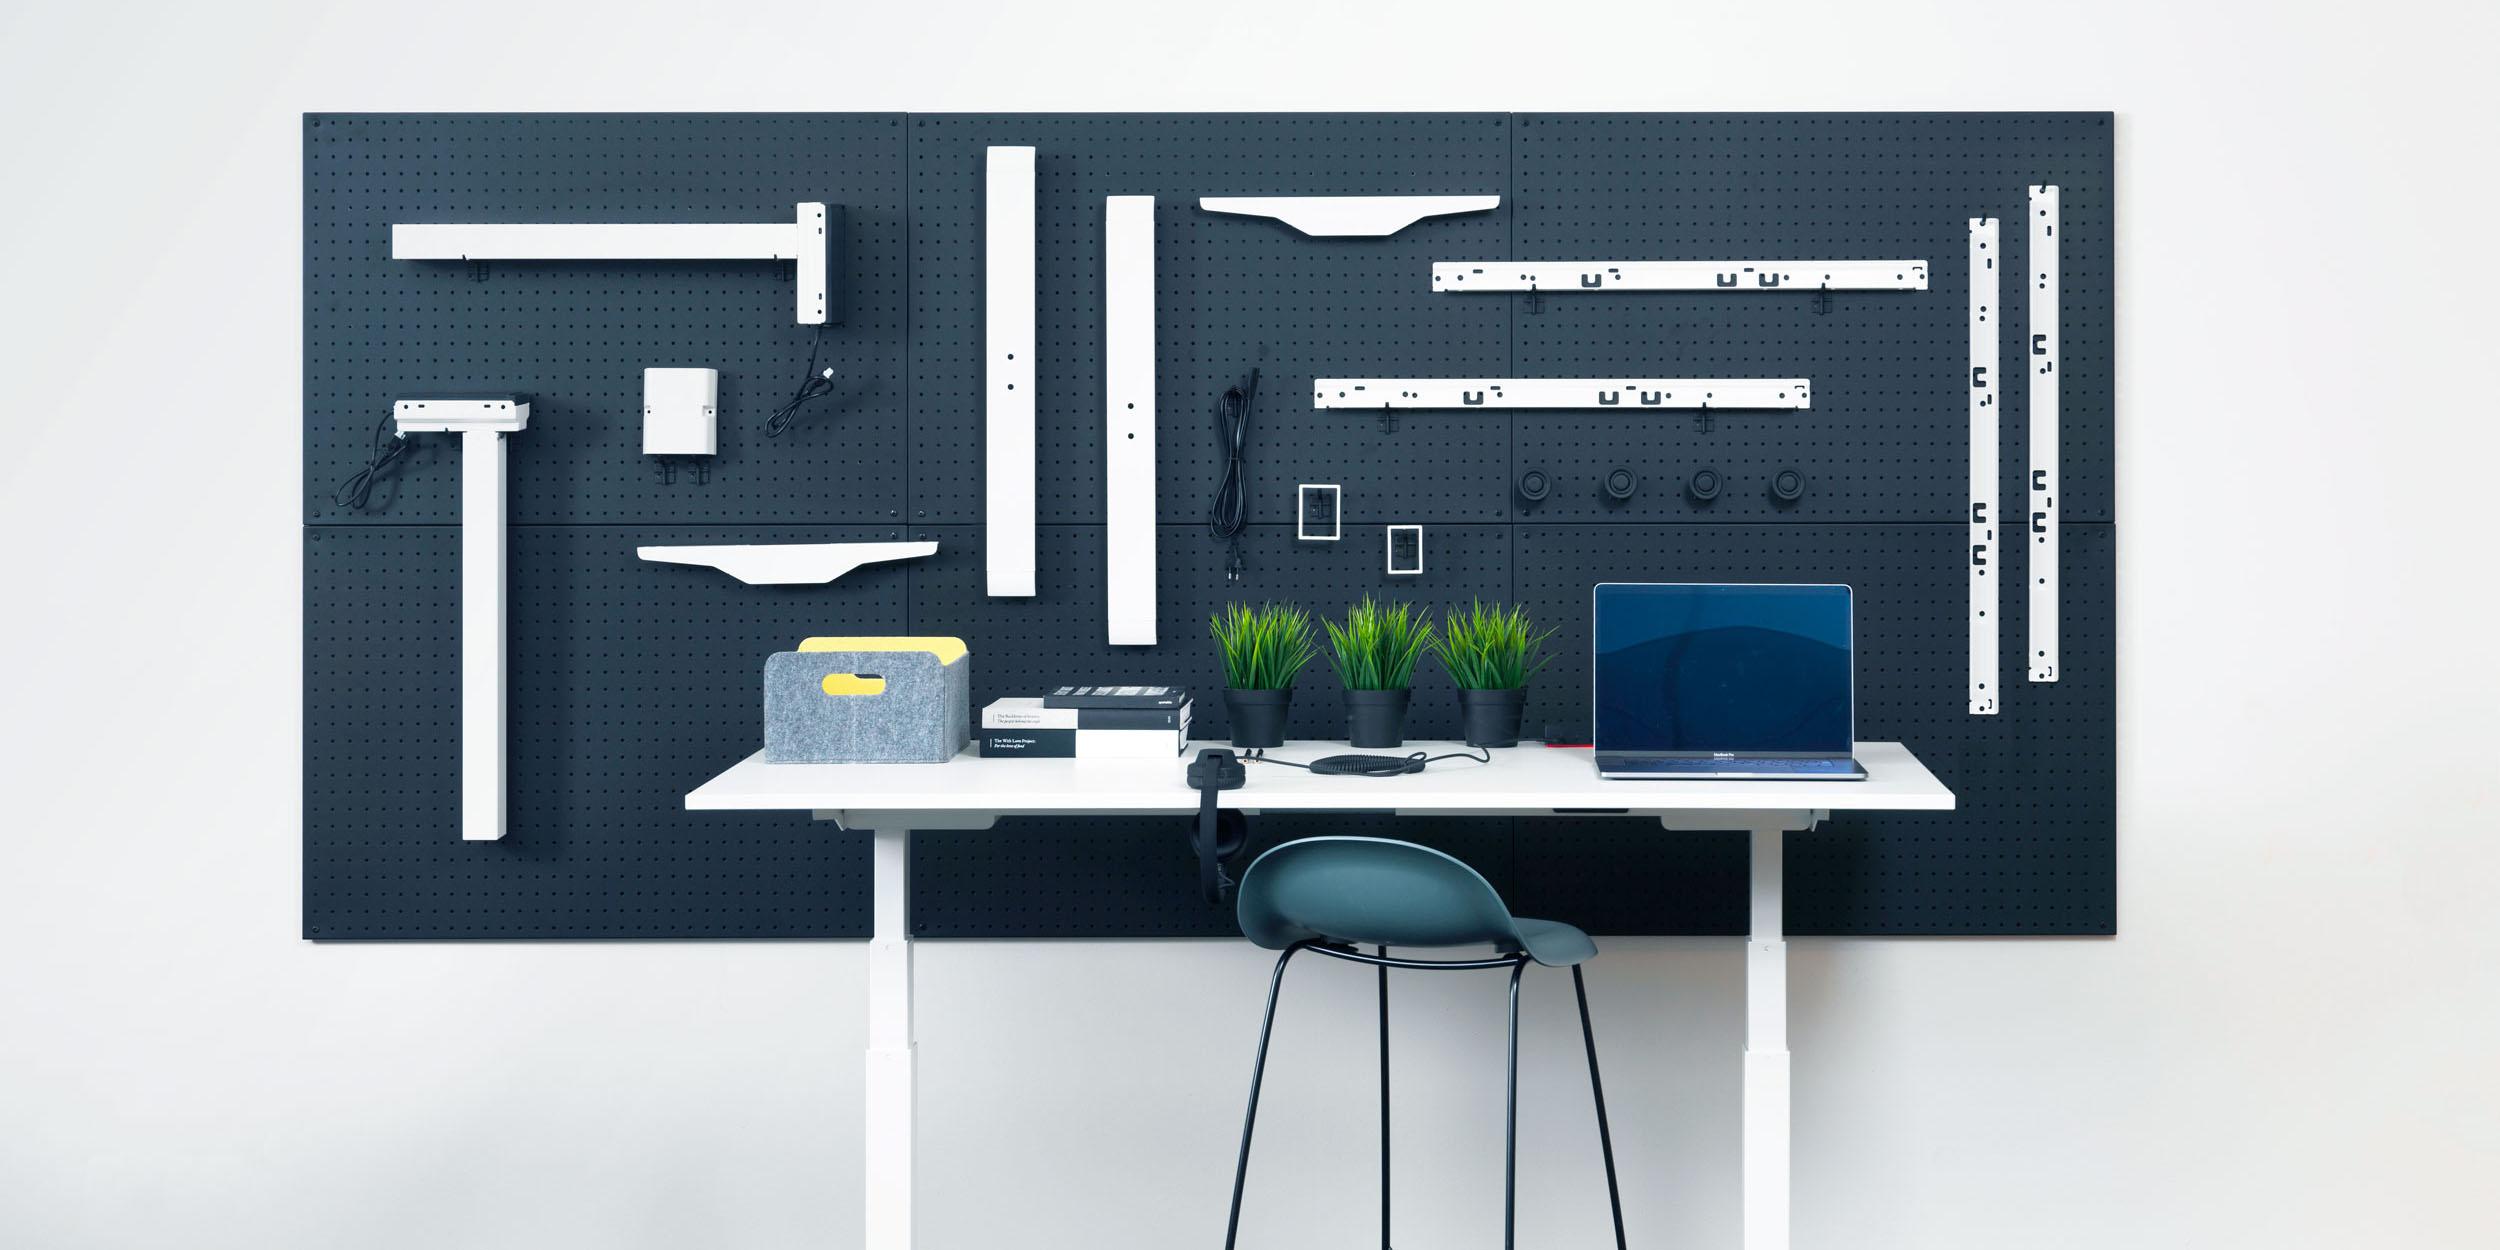 Oscar-&-Gottfrid-desk-components-sml-ws-01 800 X 400